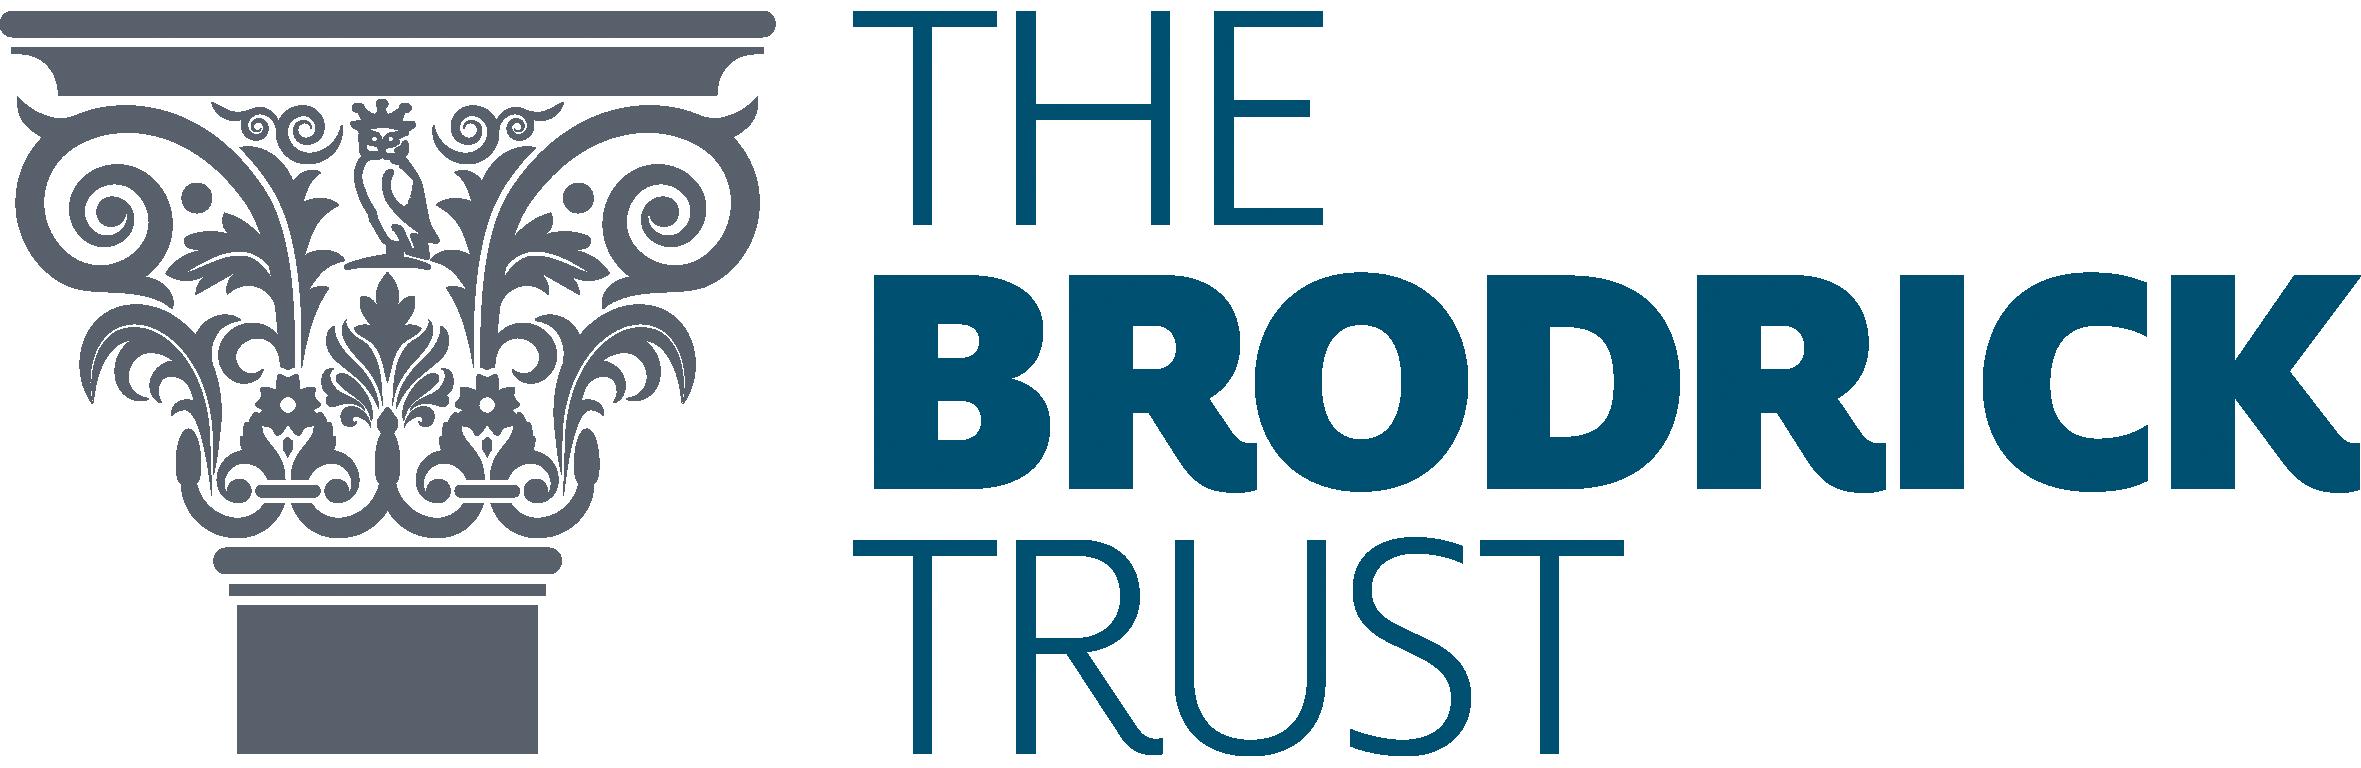 Brodrick Trust Logo RGB hi-res 300dpi